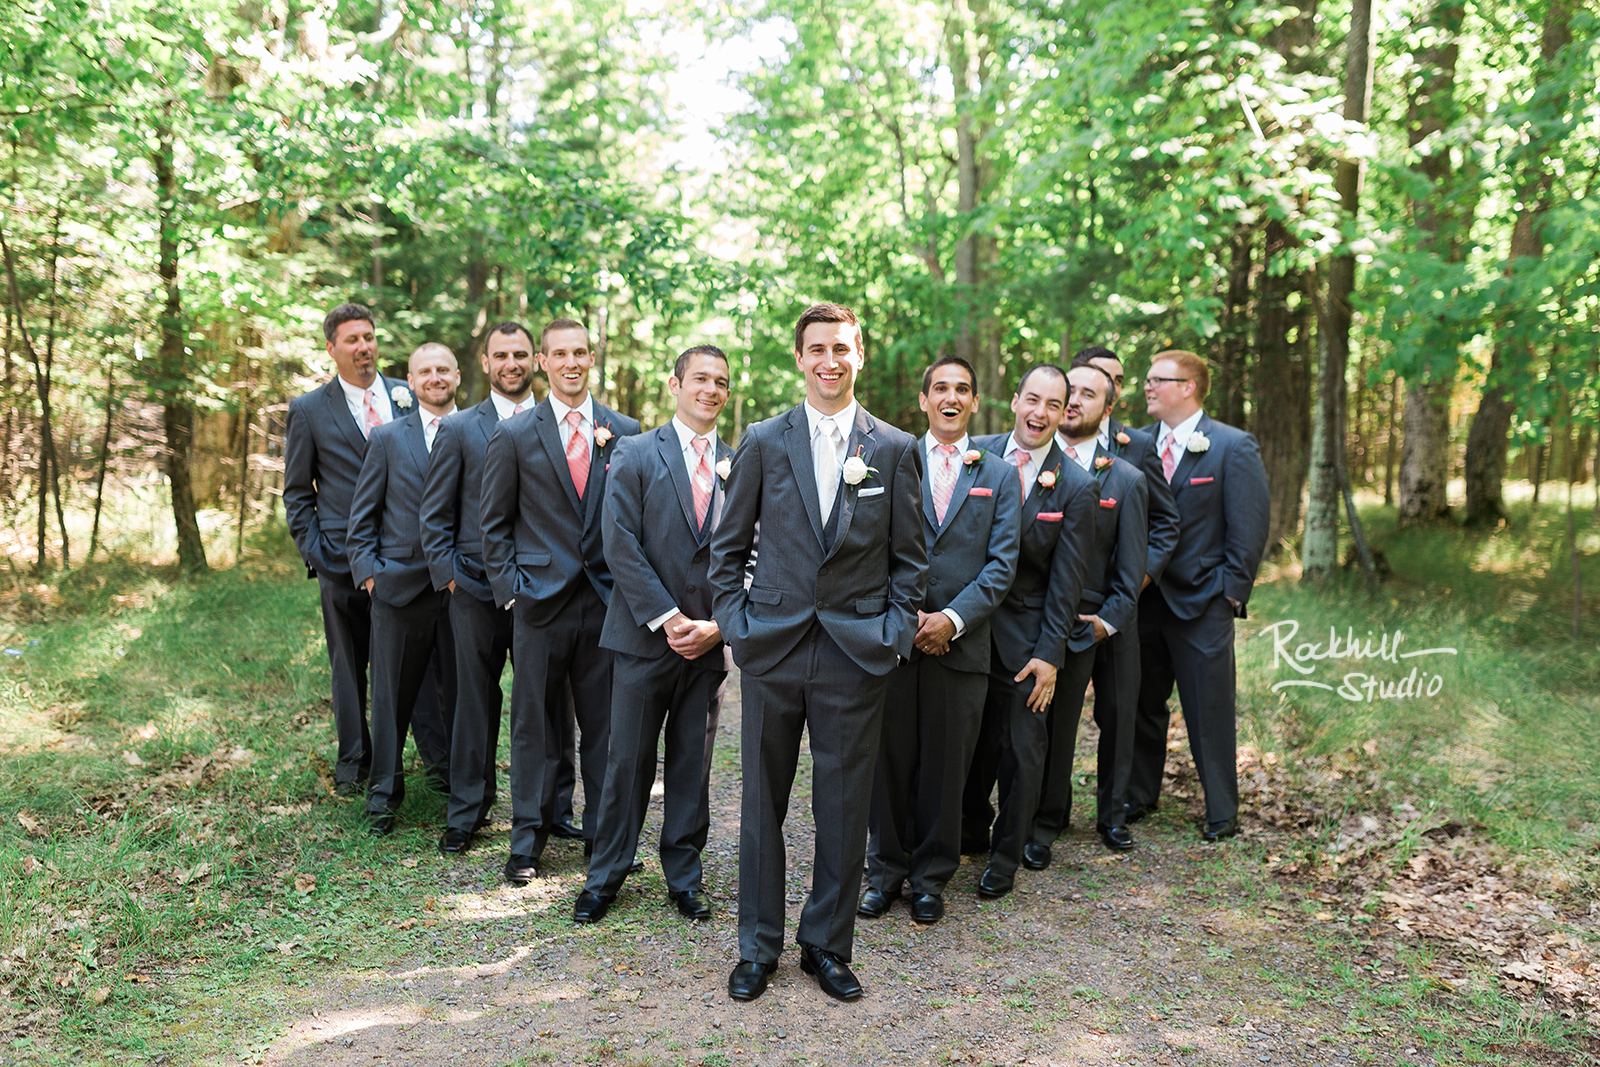 marquette-wedding-upper-peninsula-northern-michigan-wedding-ck-photography-wedding-party-13.jpg